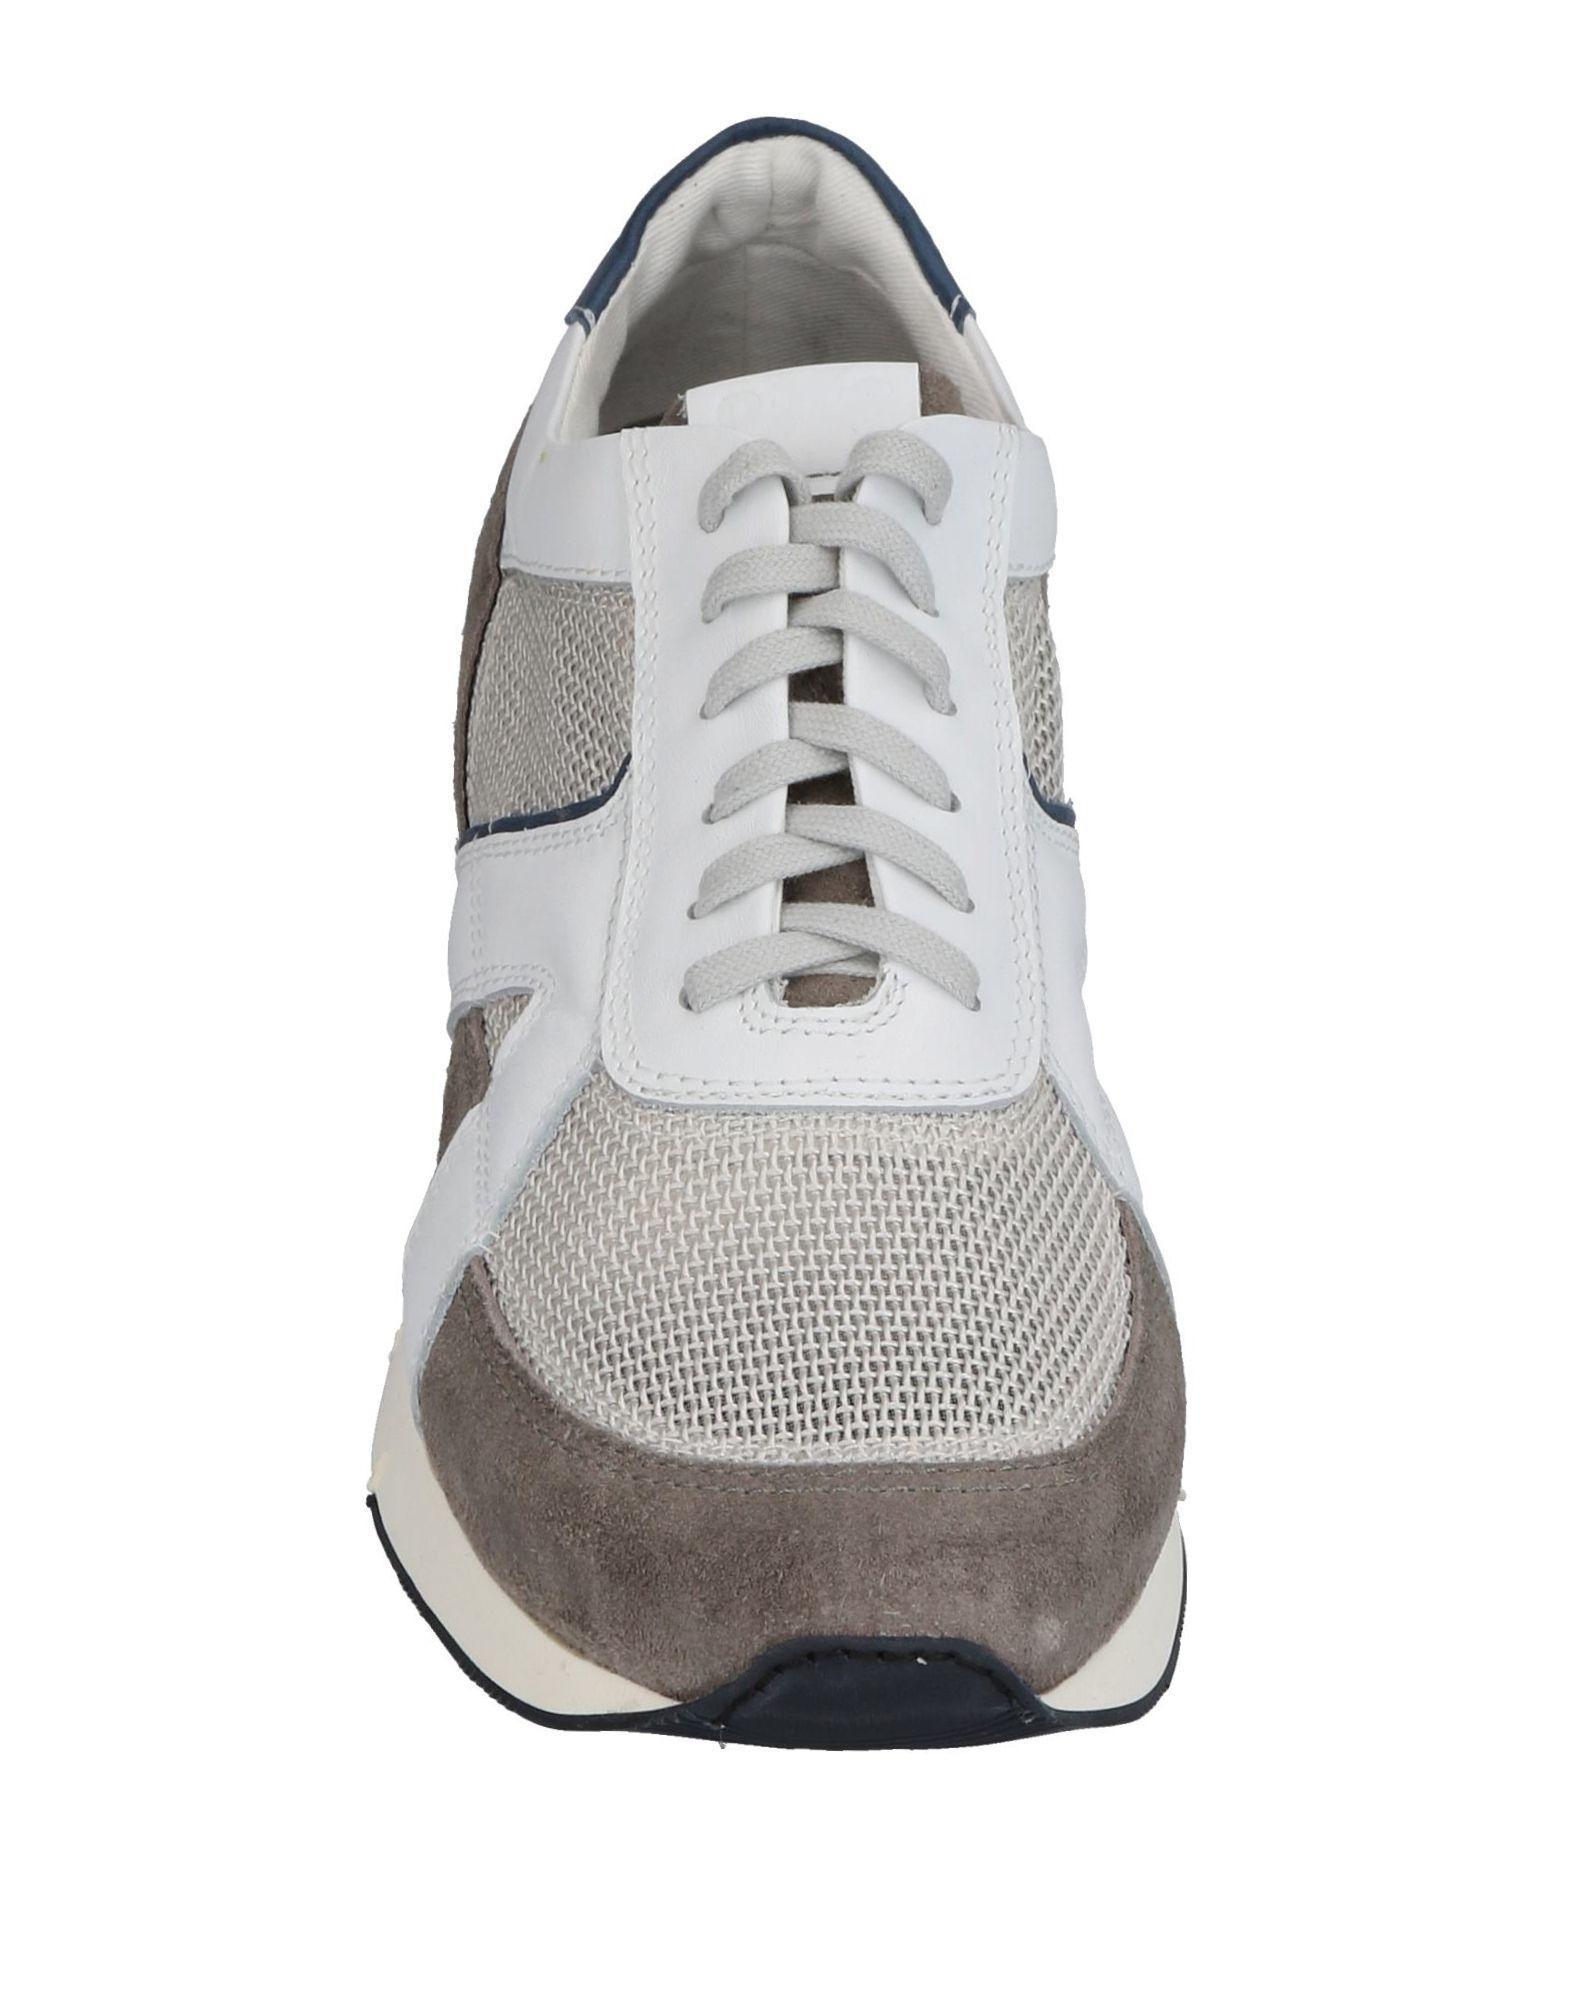 O.X.S. Sneakers - - - Men O.X.S. Sneakers online on  Canada - 11455719KA 6860d2